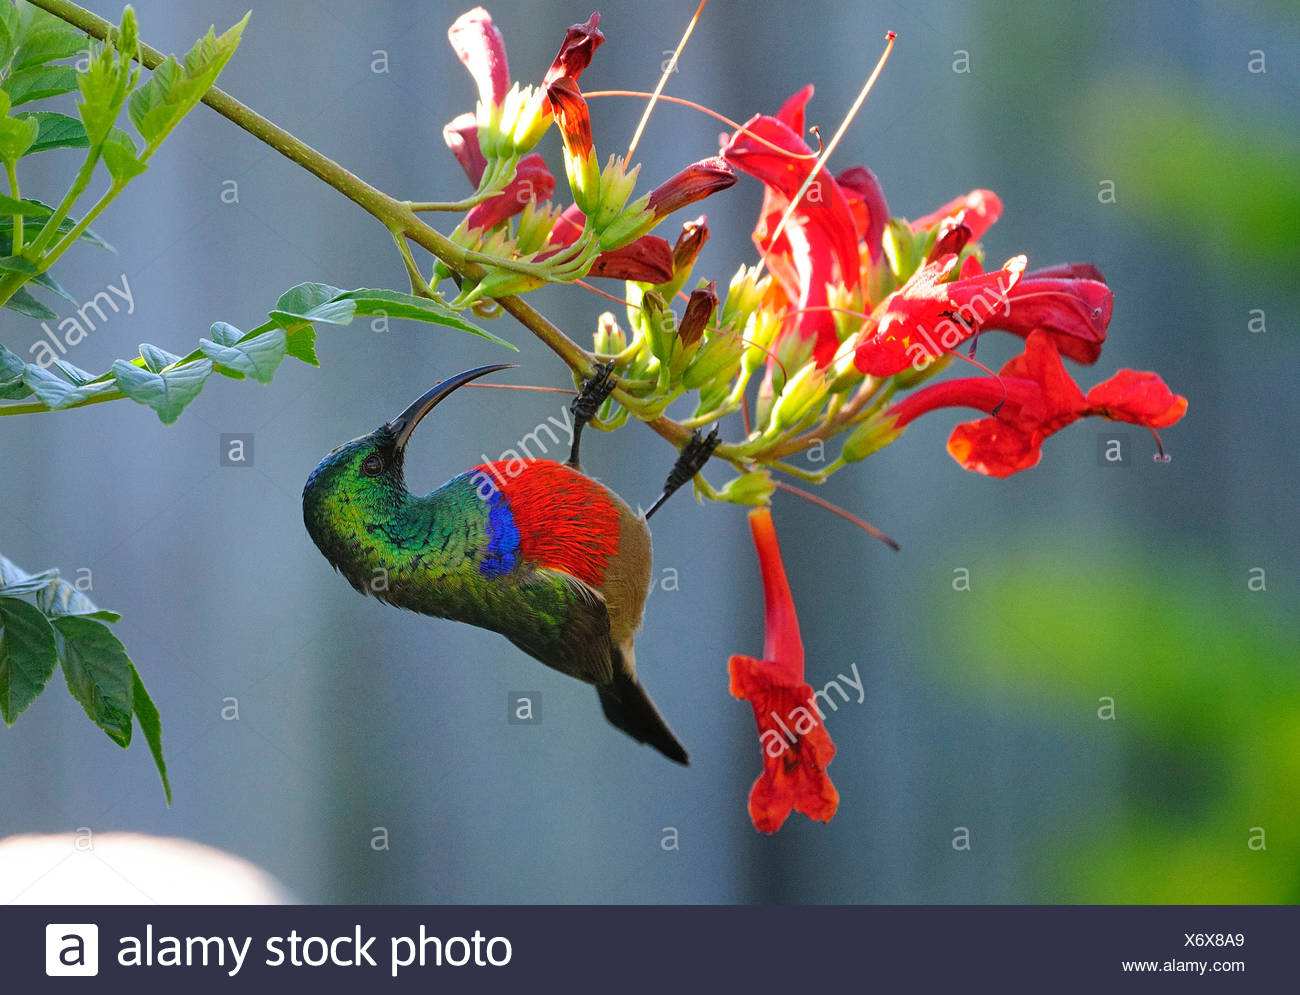 Lesser double-collared sunbird (Cinnyris chalybeus, Nectarinia chalybea), at red blossom, South Africa - Stock Image